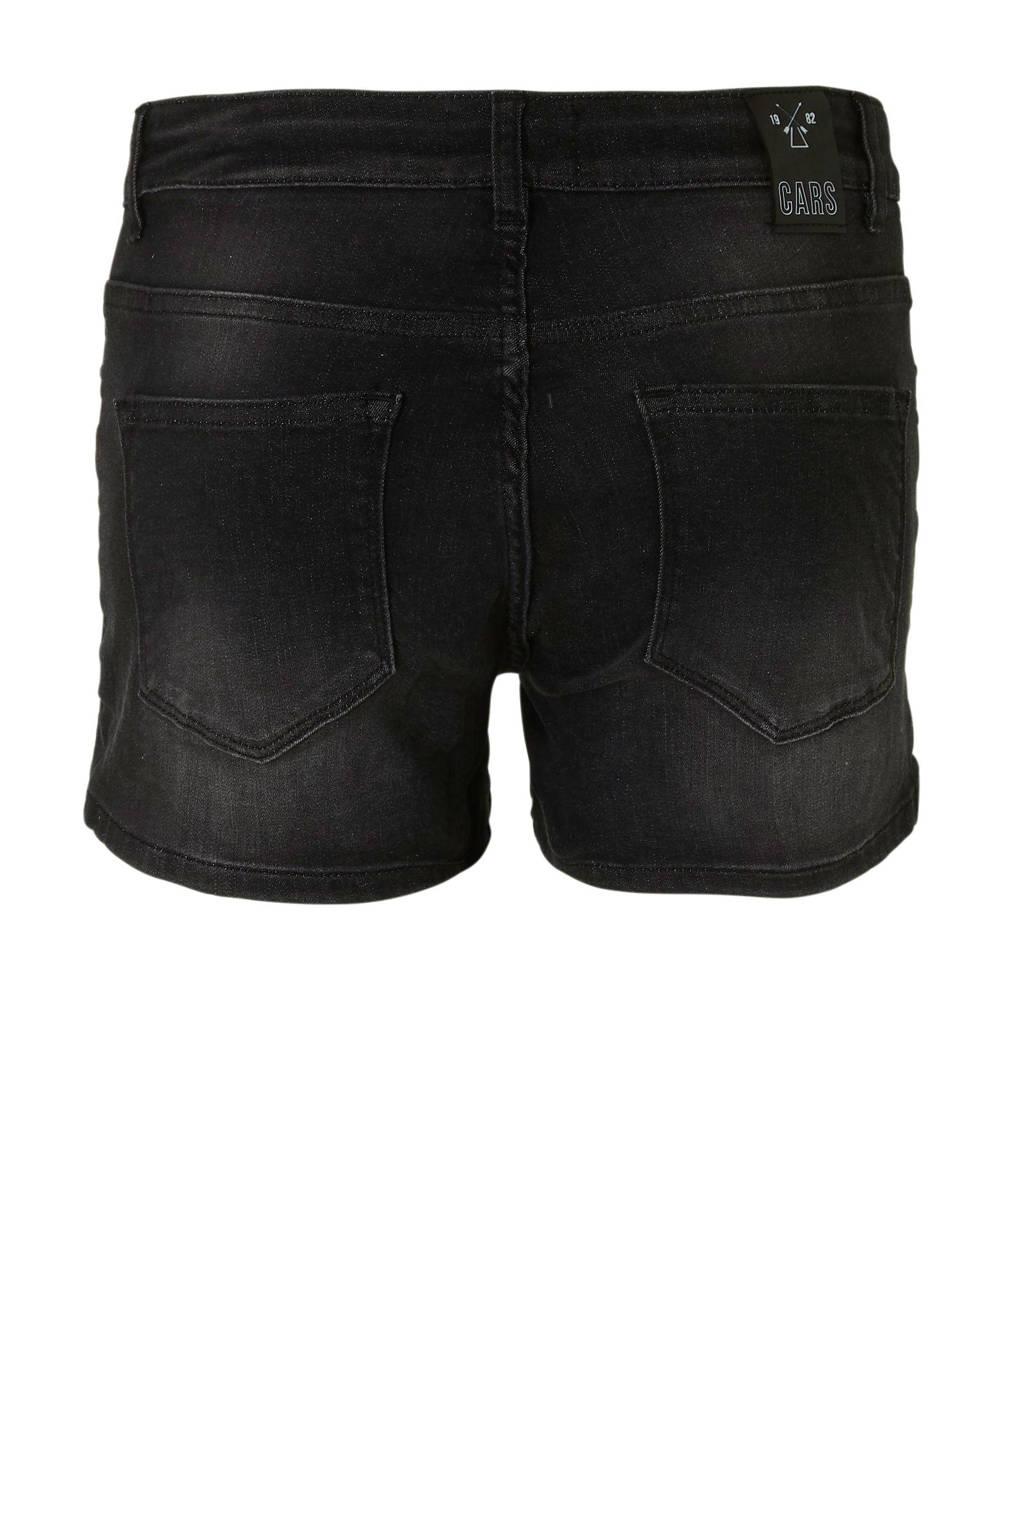 Cars jeans short Romy antraciet, Antraciet